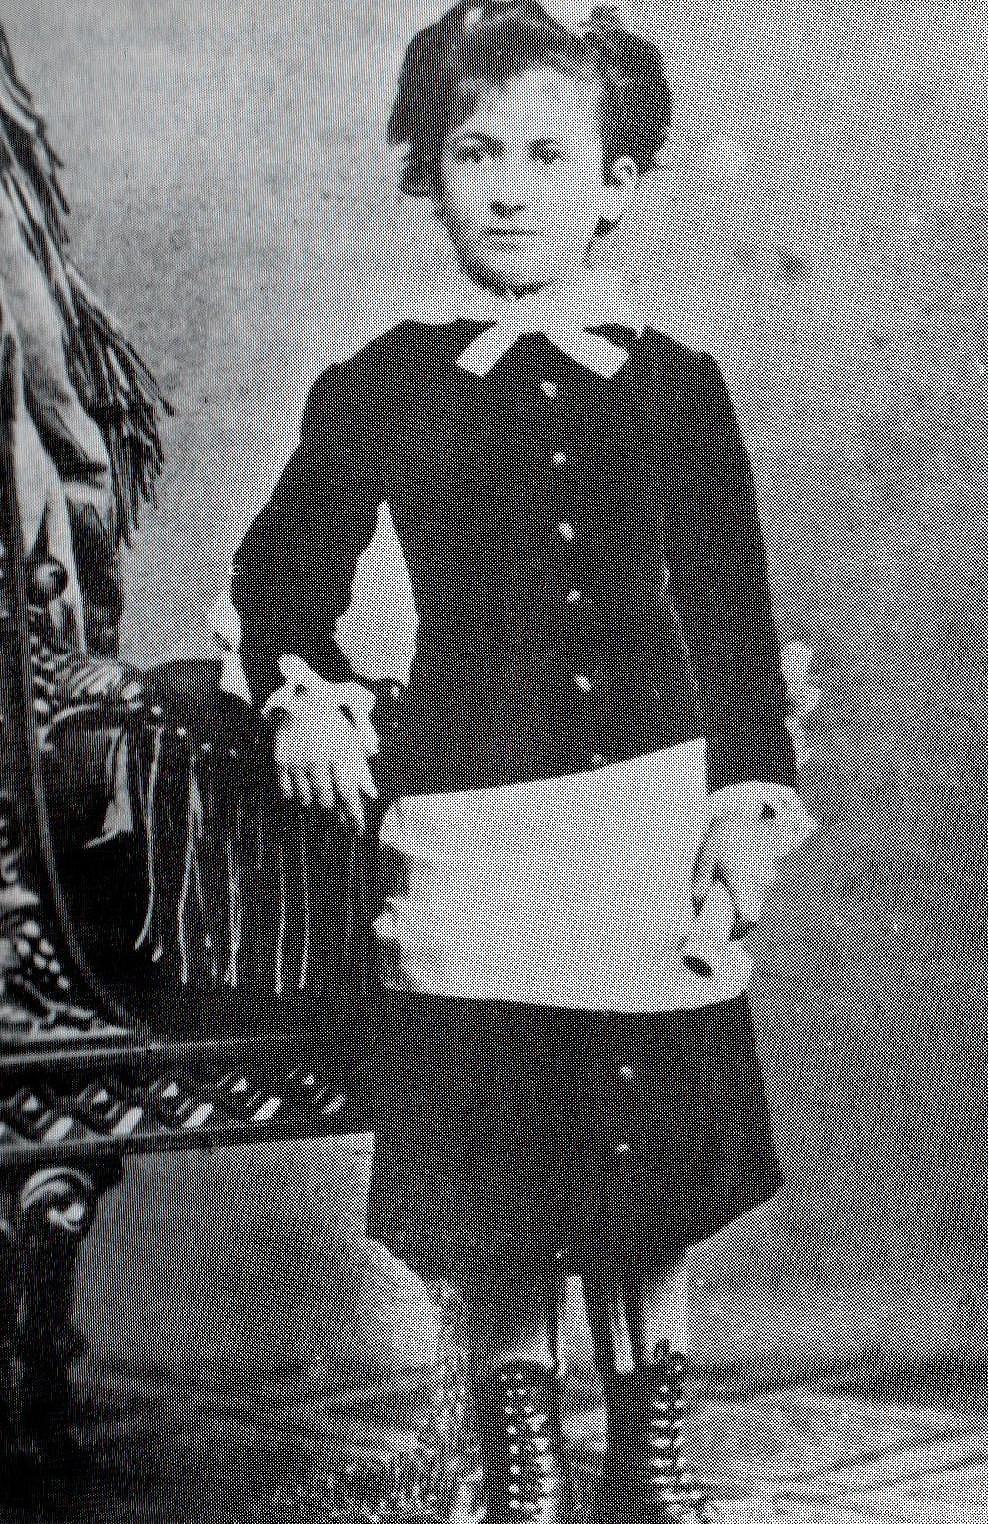 Maria_Montessori_um_1880-151410.jpg